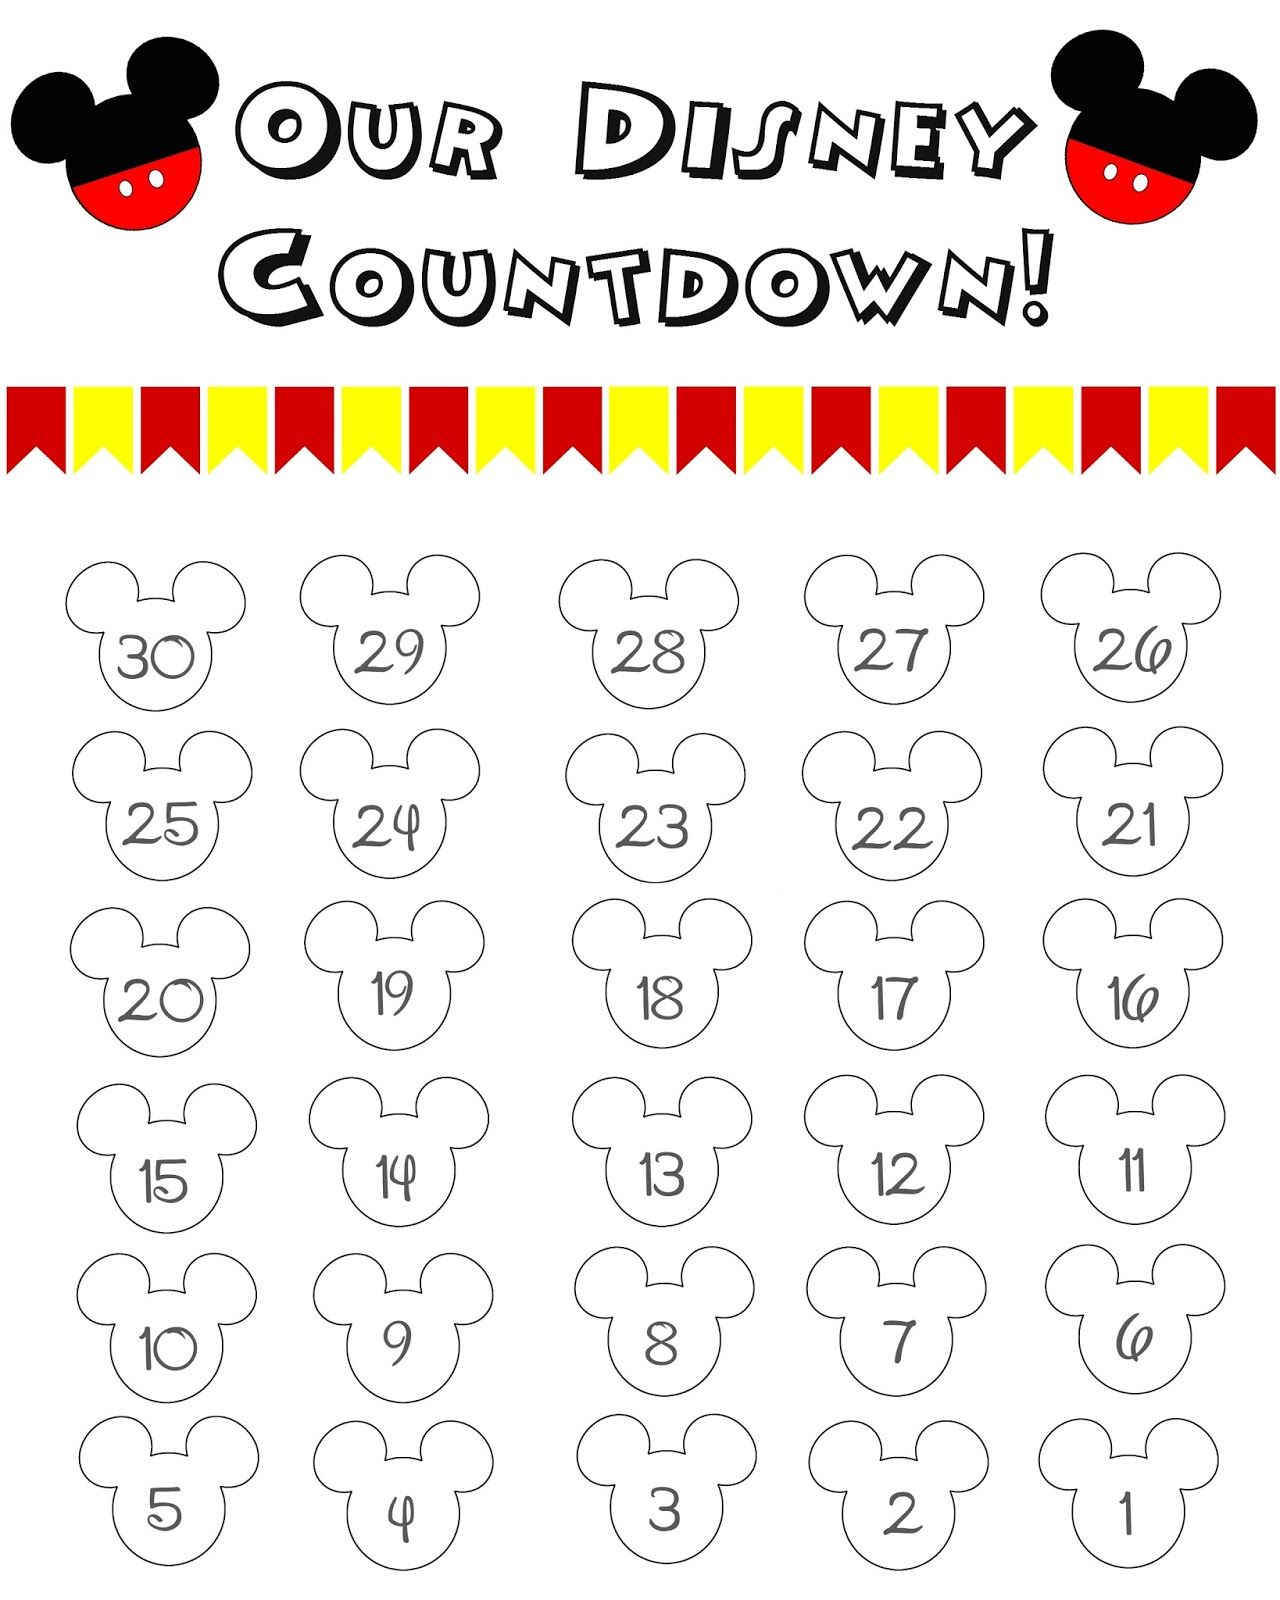 Disney World Countdown Calendar - Free Printable   The Momma